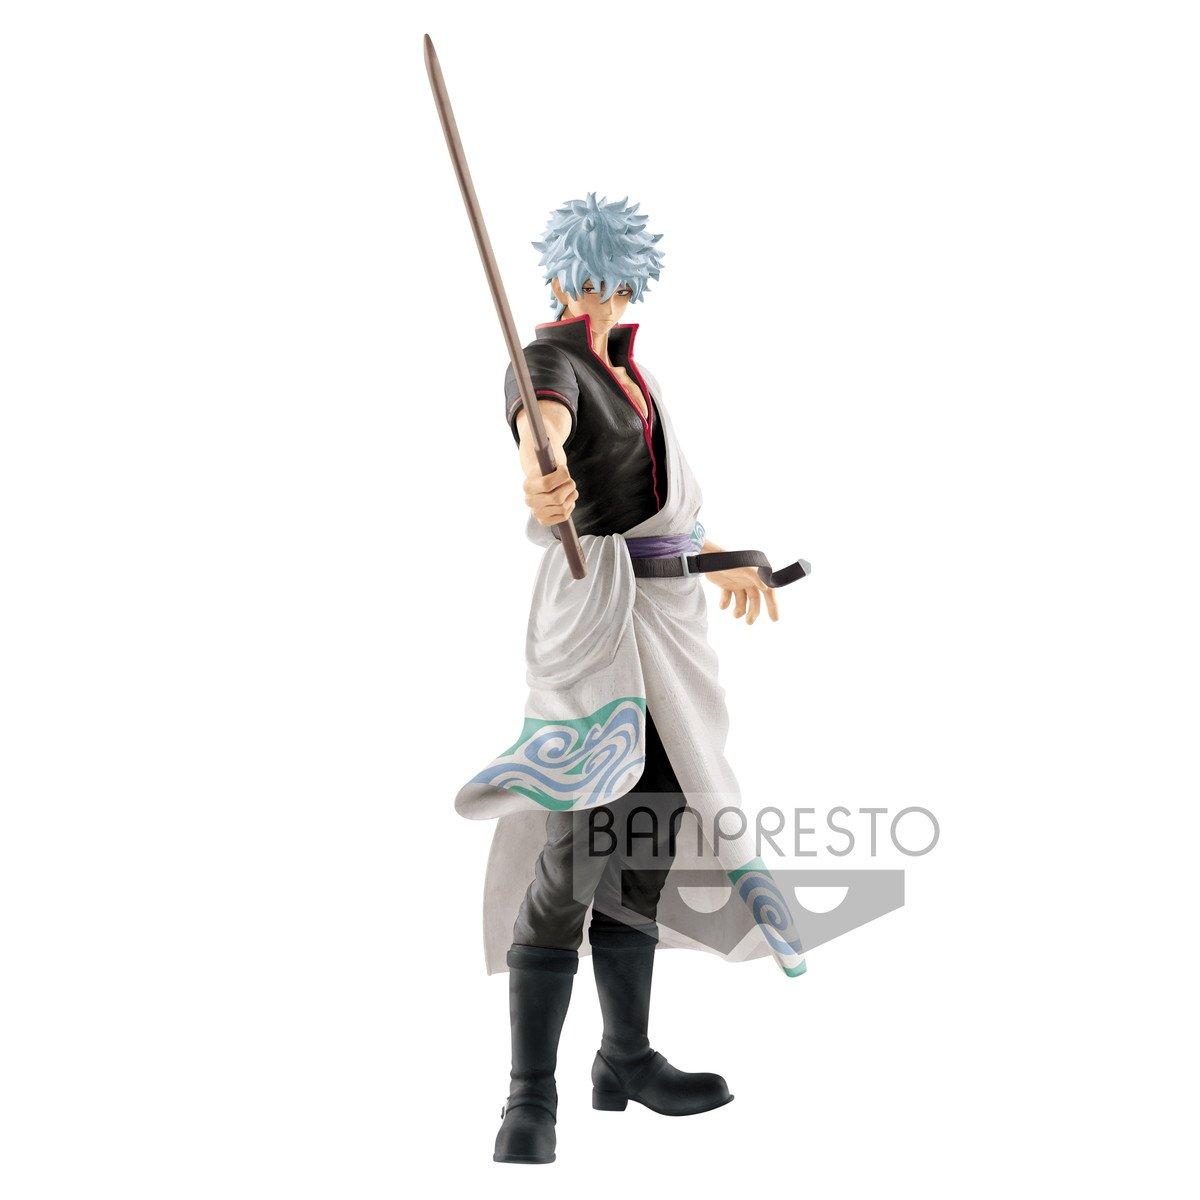 Banpresto Gintama Katsugeki - Kabukicho- Gintoki Sakata Toy, White